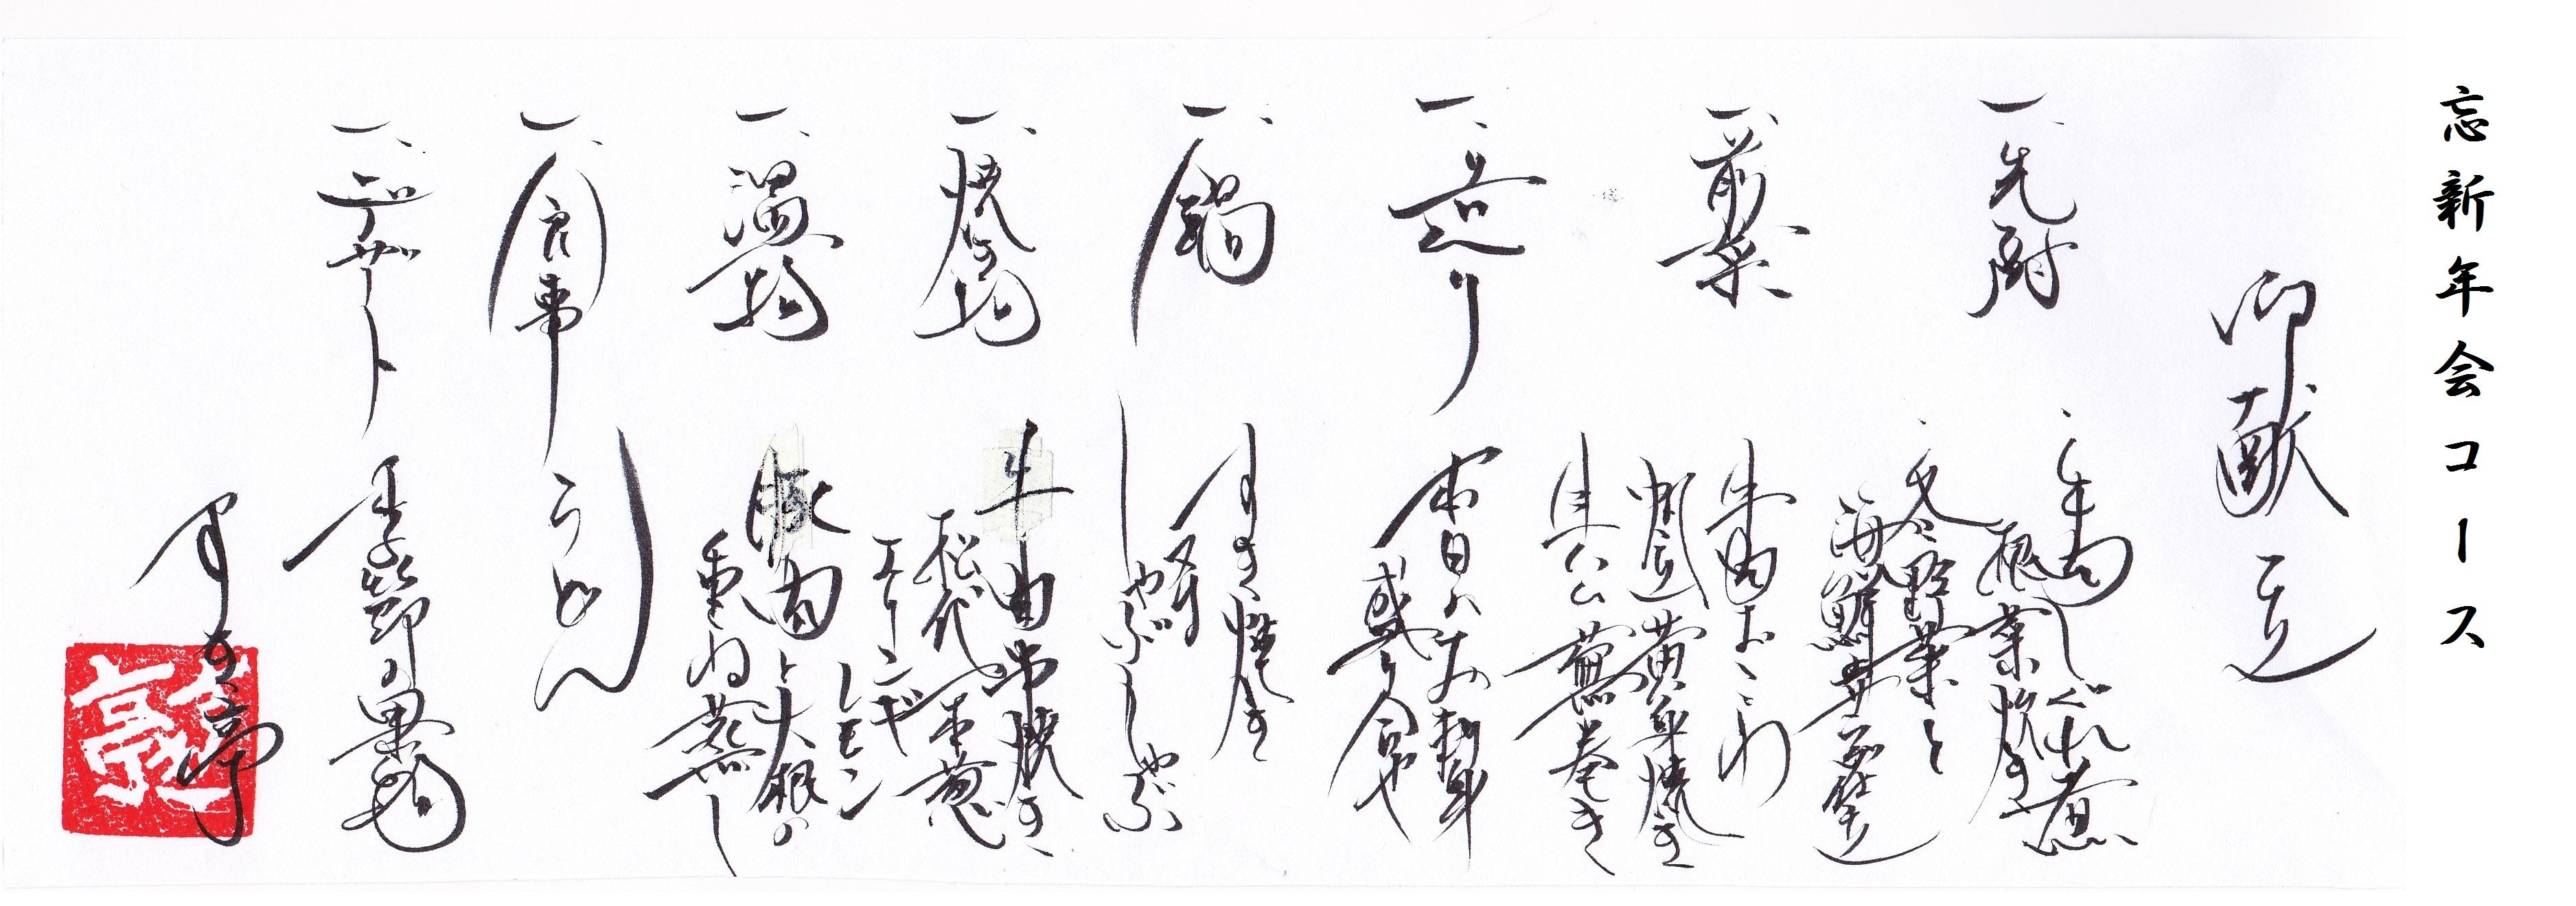 oshinagaki2013.14.忘新年会.01.jpg